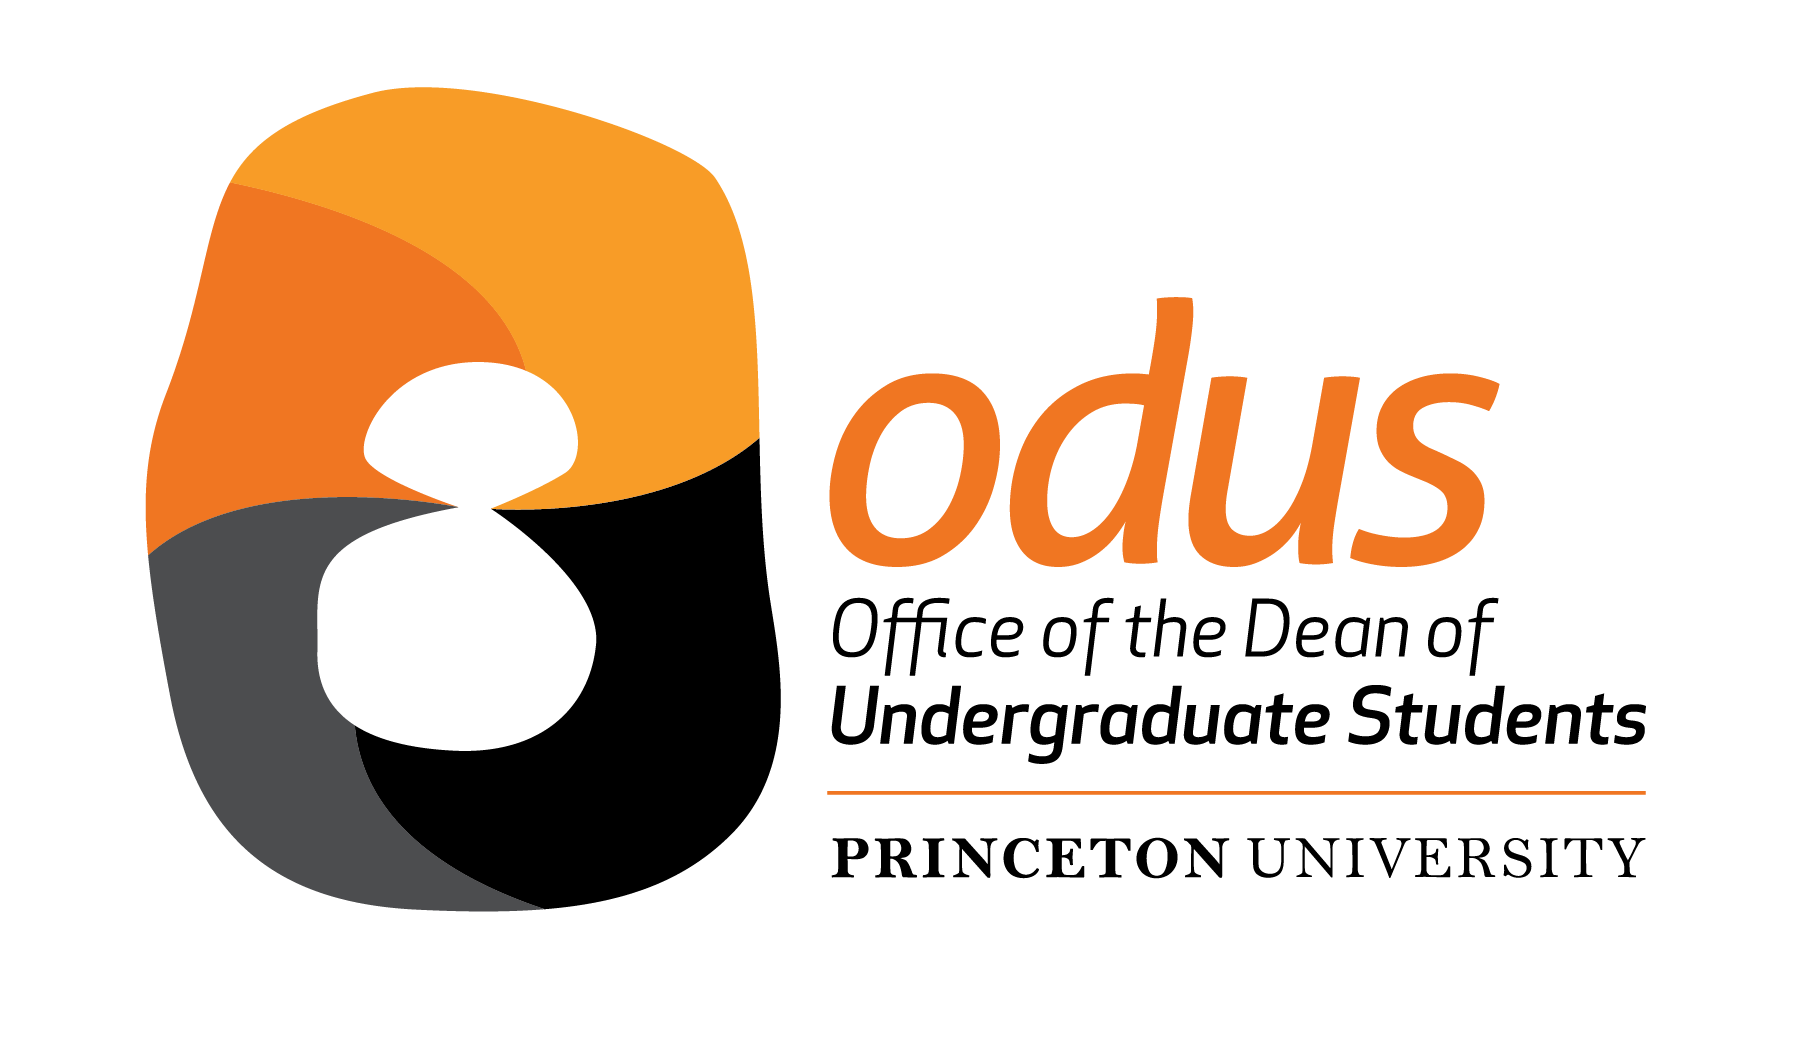 Princeton ODUS logo.